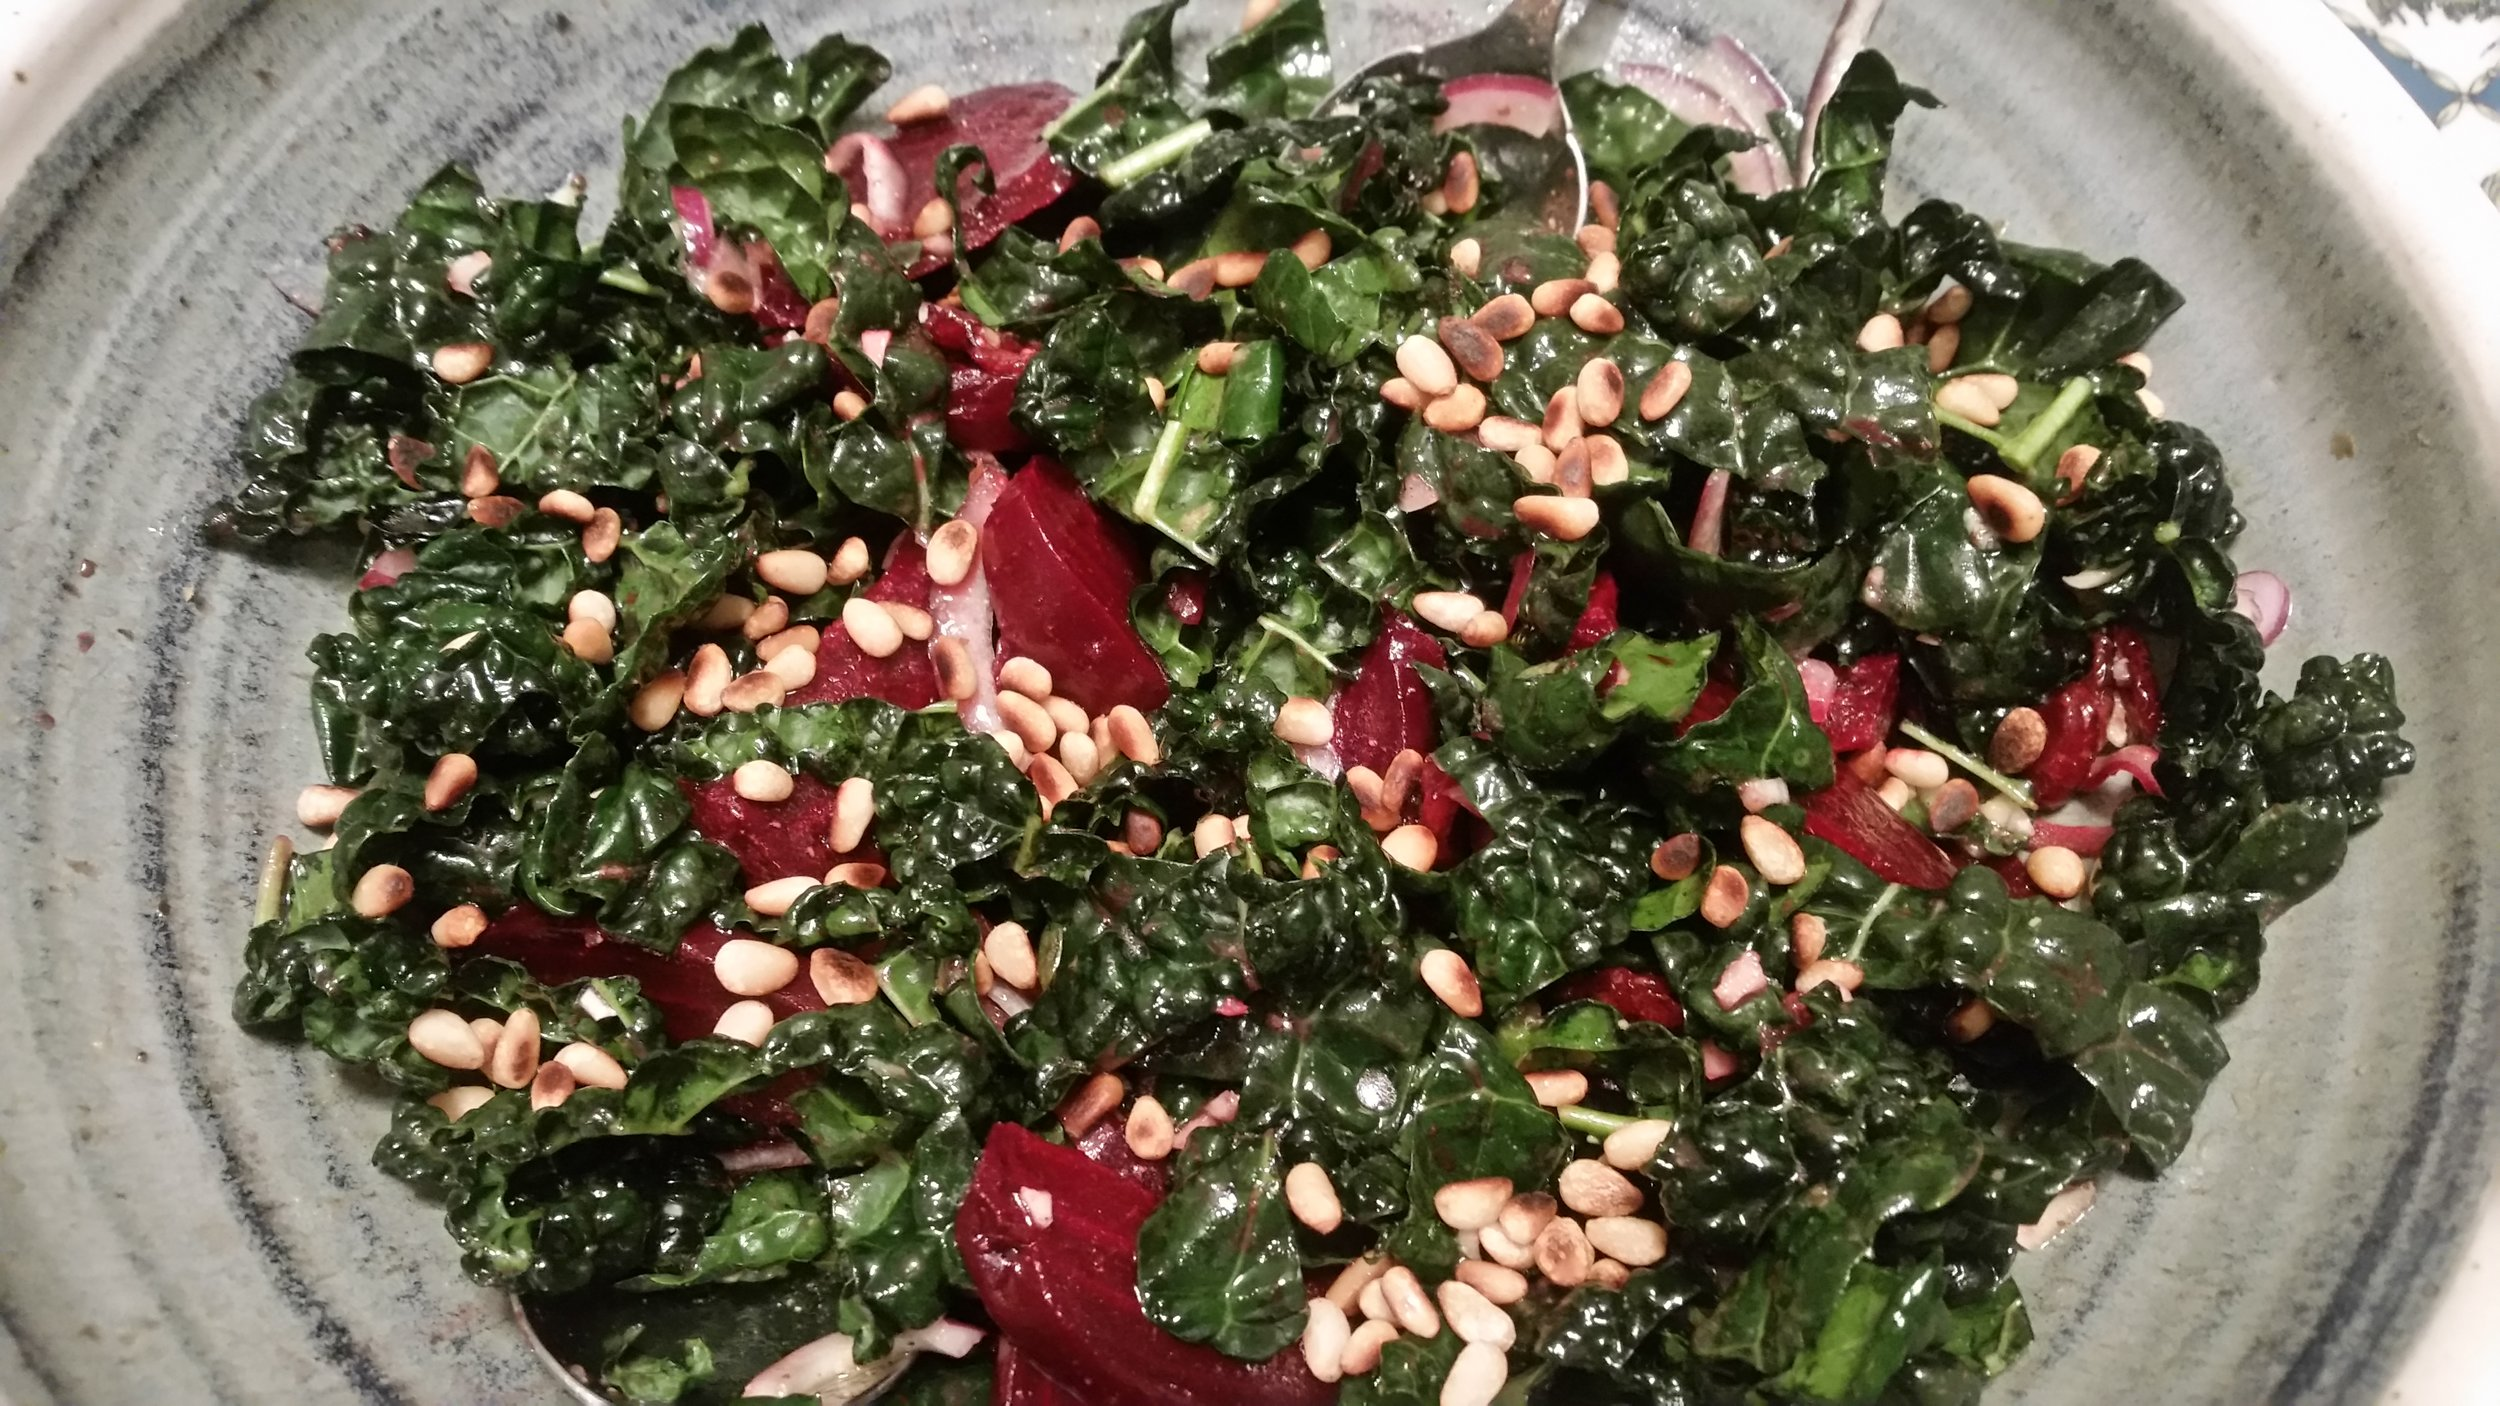 Beet, Kale and Pine-Nut Salad